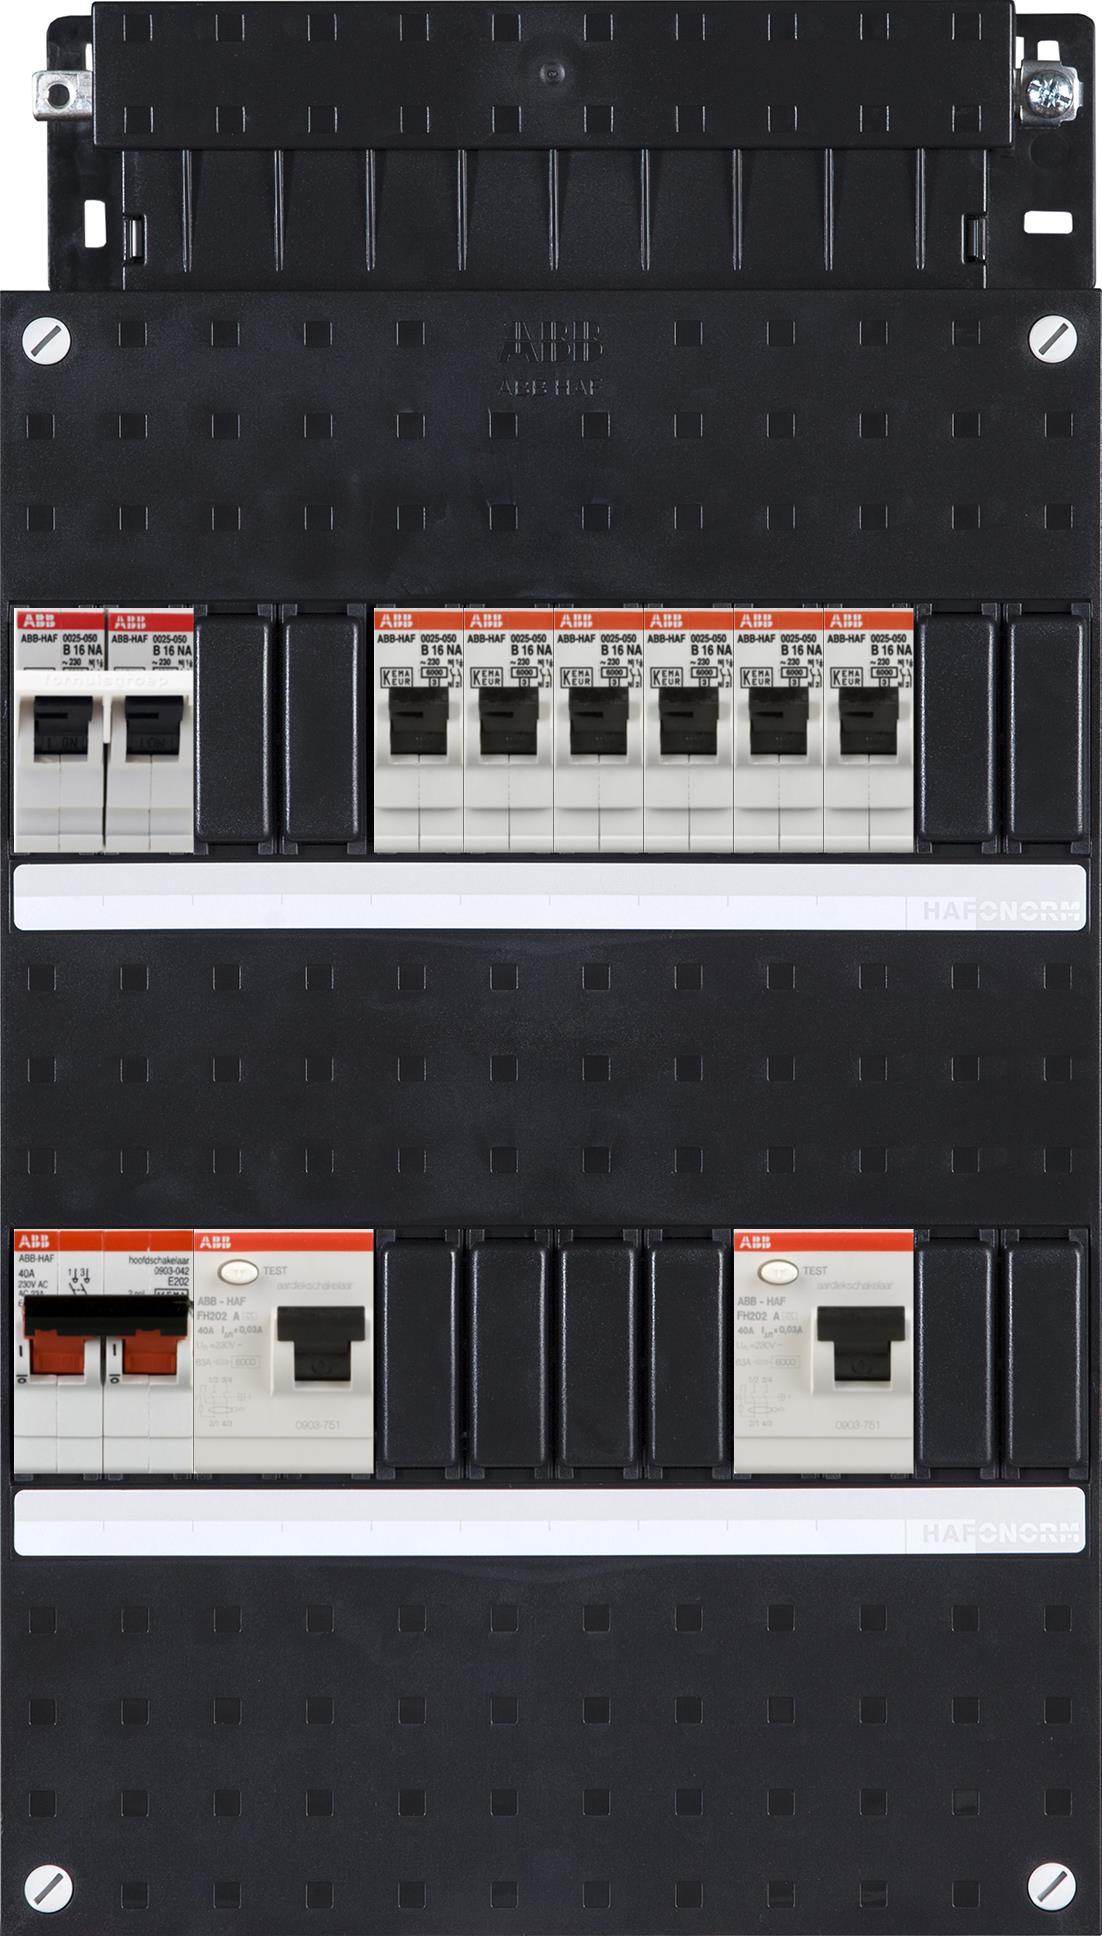 ABB HAF Installatiekast 330x220mm, 6-groepen 1-fase, 2xALS, HS 40A 2-polig, kookgroep 1-fase